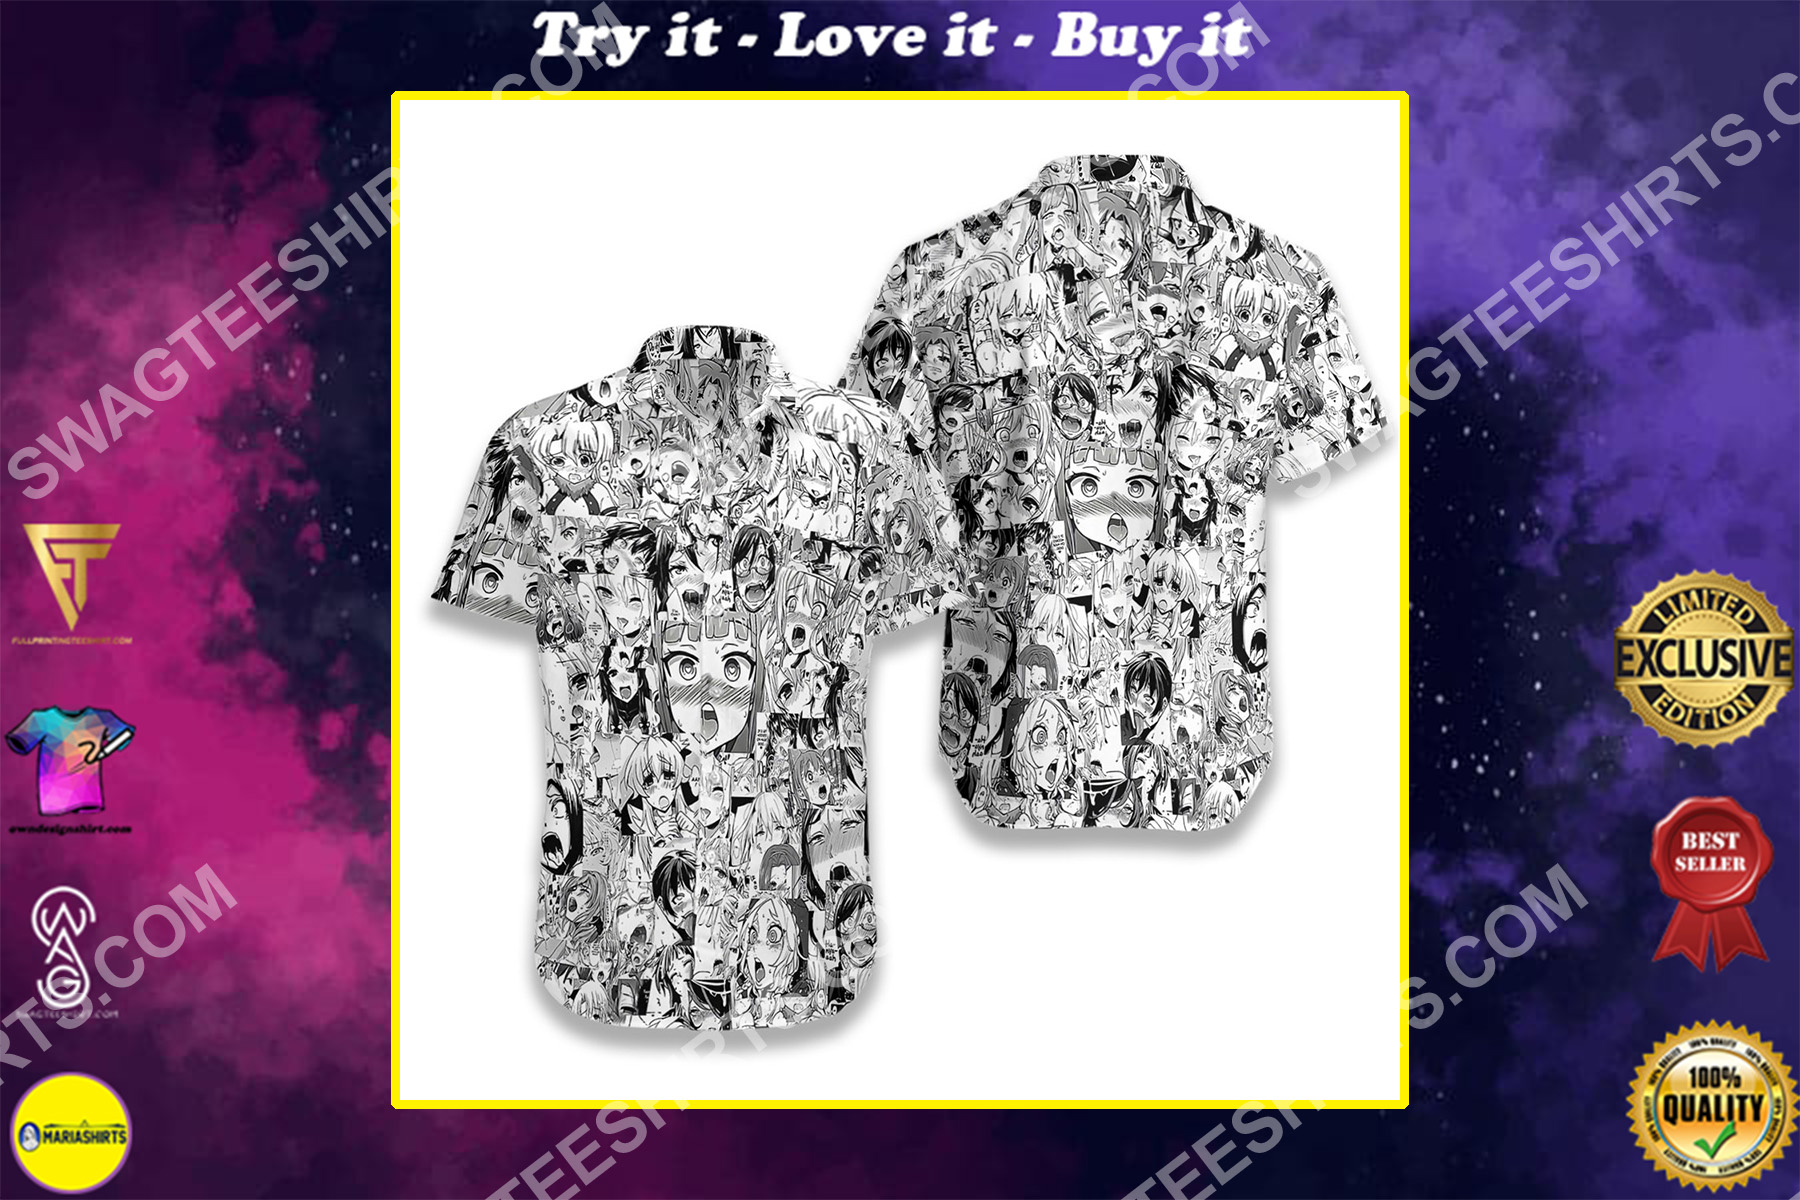 agehao anime all over printed hawaiian shirt - Copy - Copy